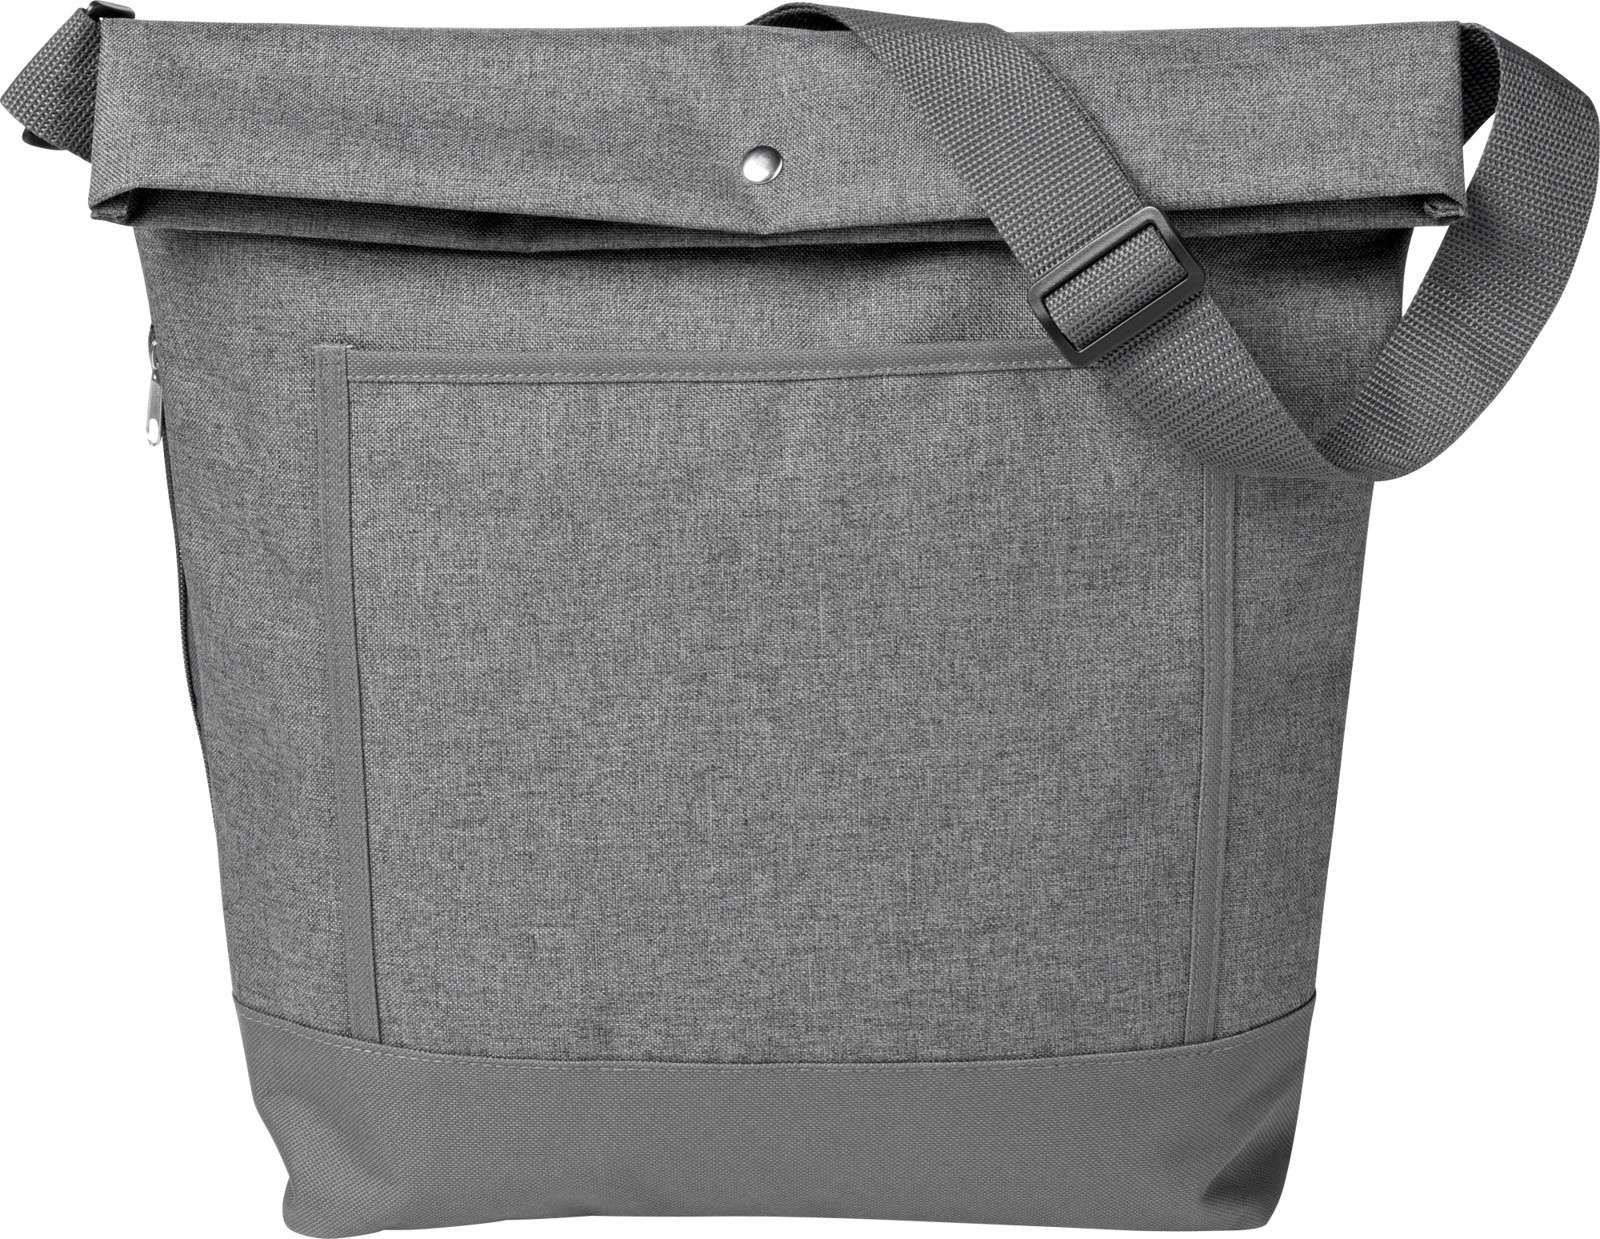 Polycanvas (600D) tote bag